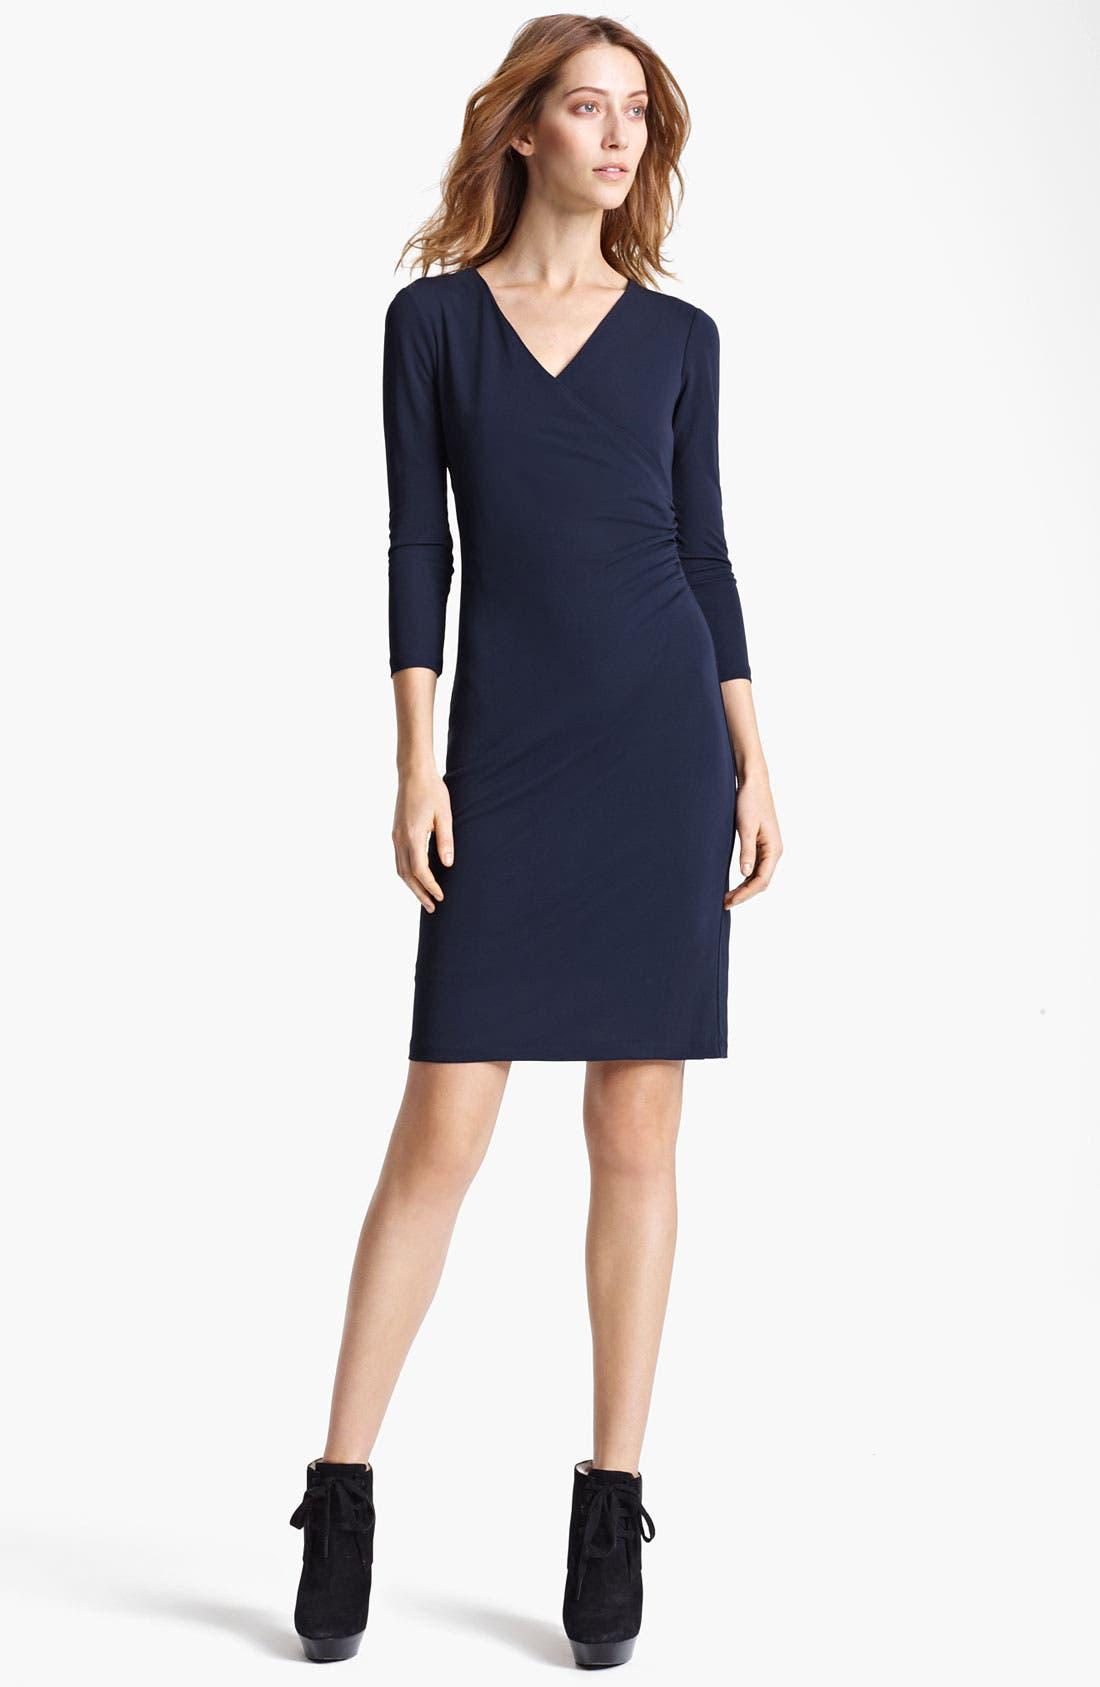 Alternate Image 1 Selected - Burberry London Crepe Jersey Dress